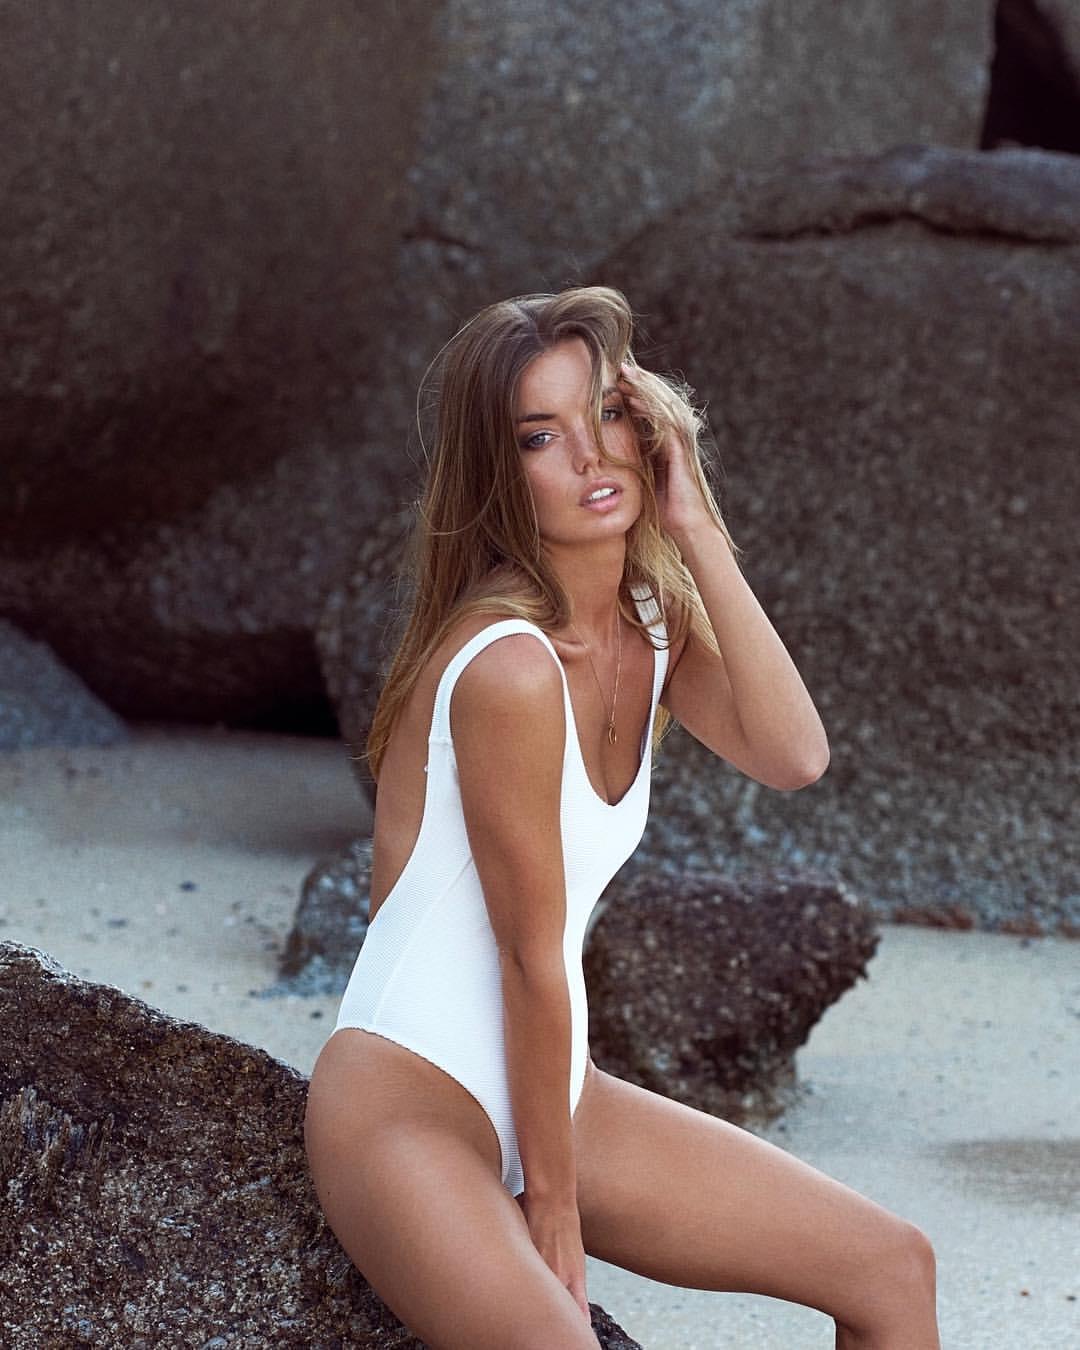 Sophie Reade photos